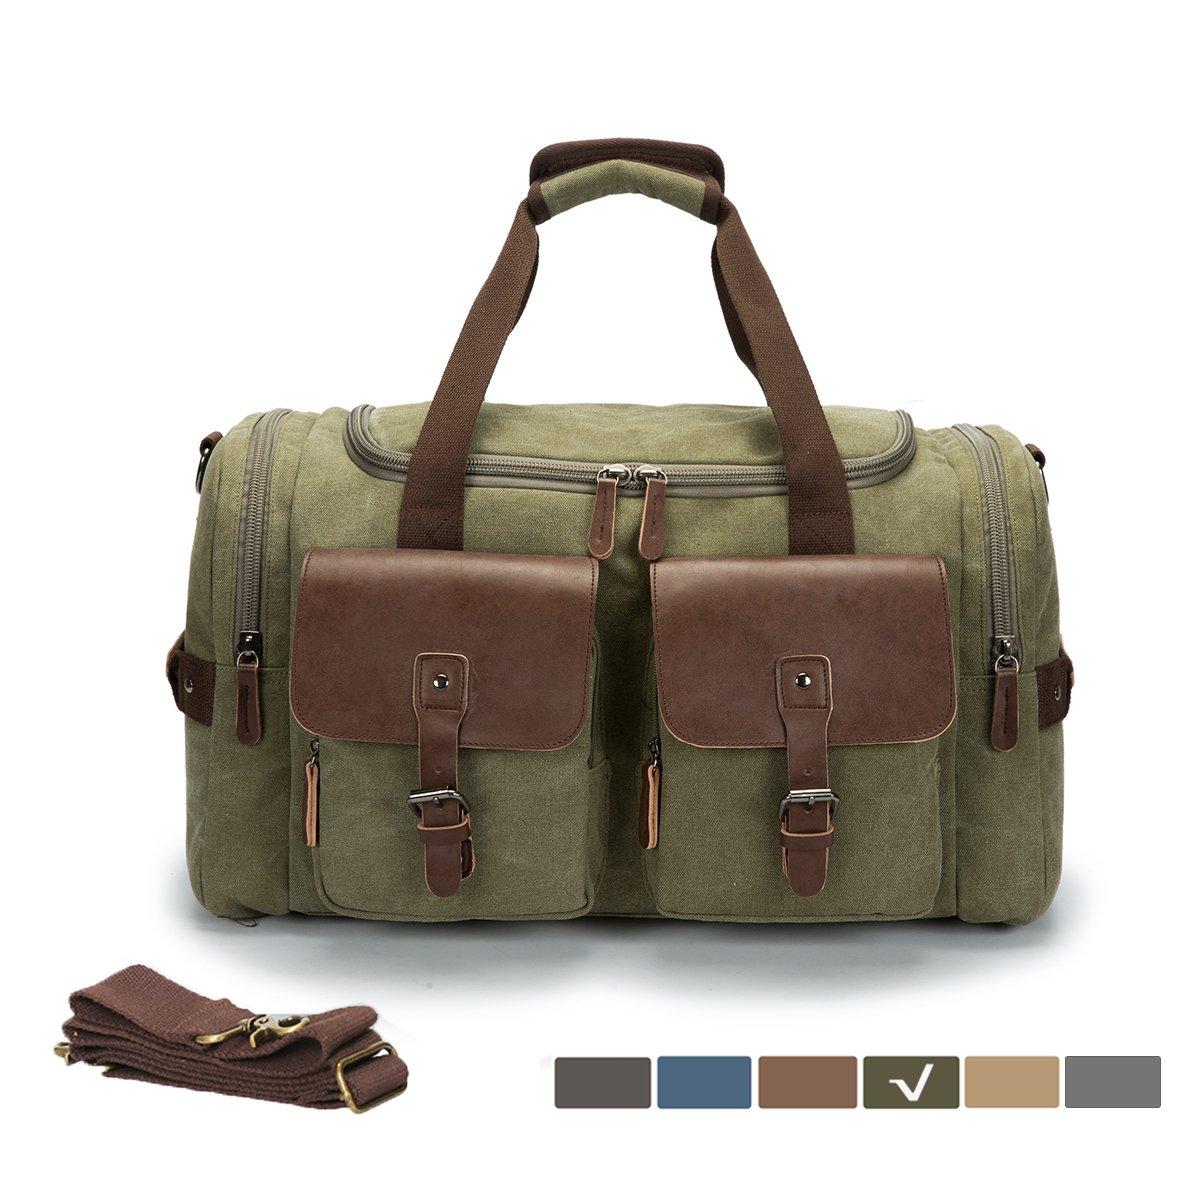 WULFUL Canvas Leather Travel Duffel Bag Oversized Luggage Overnight Bag Shoulder Handbag Weekend Bag